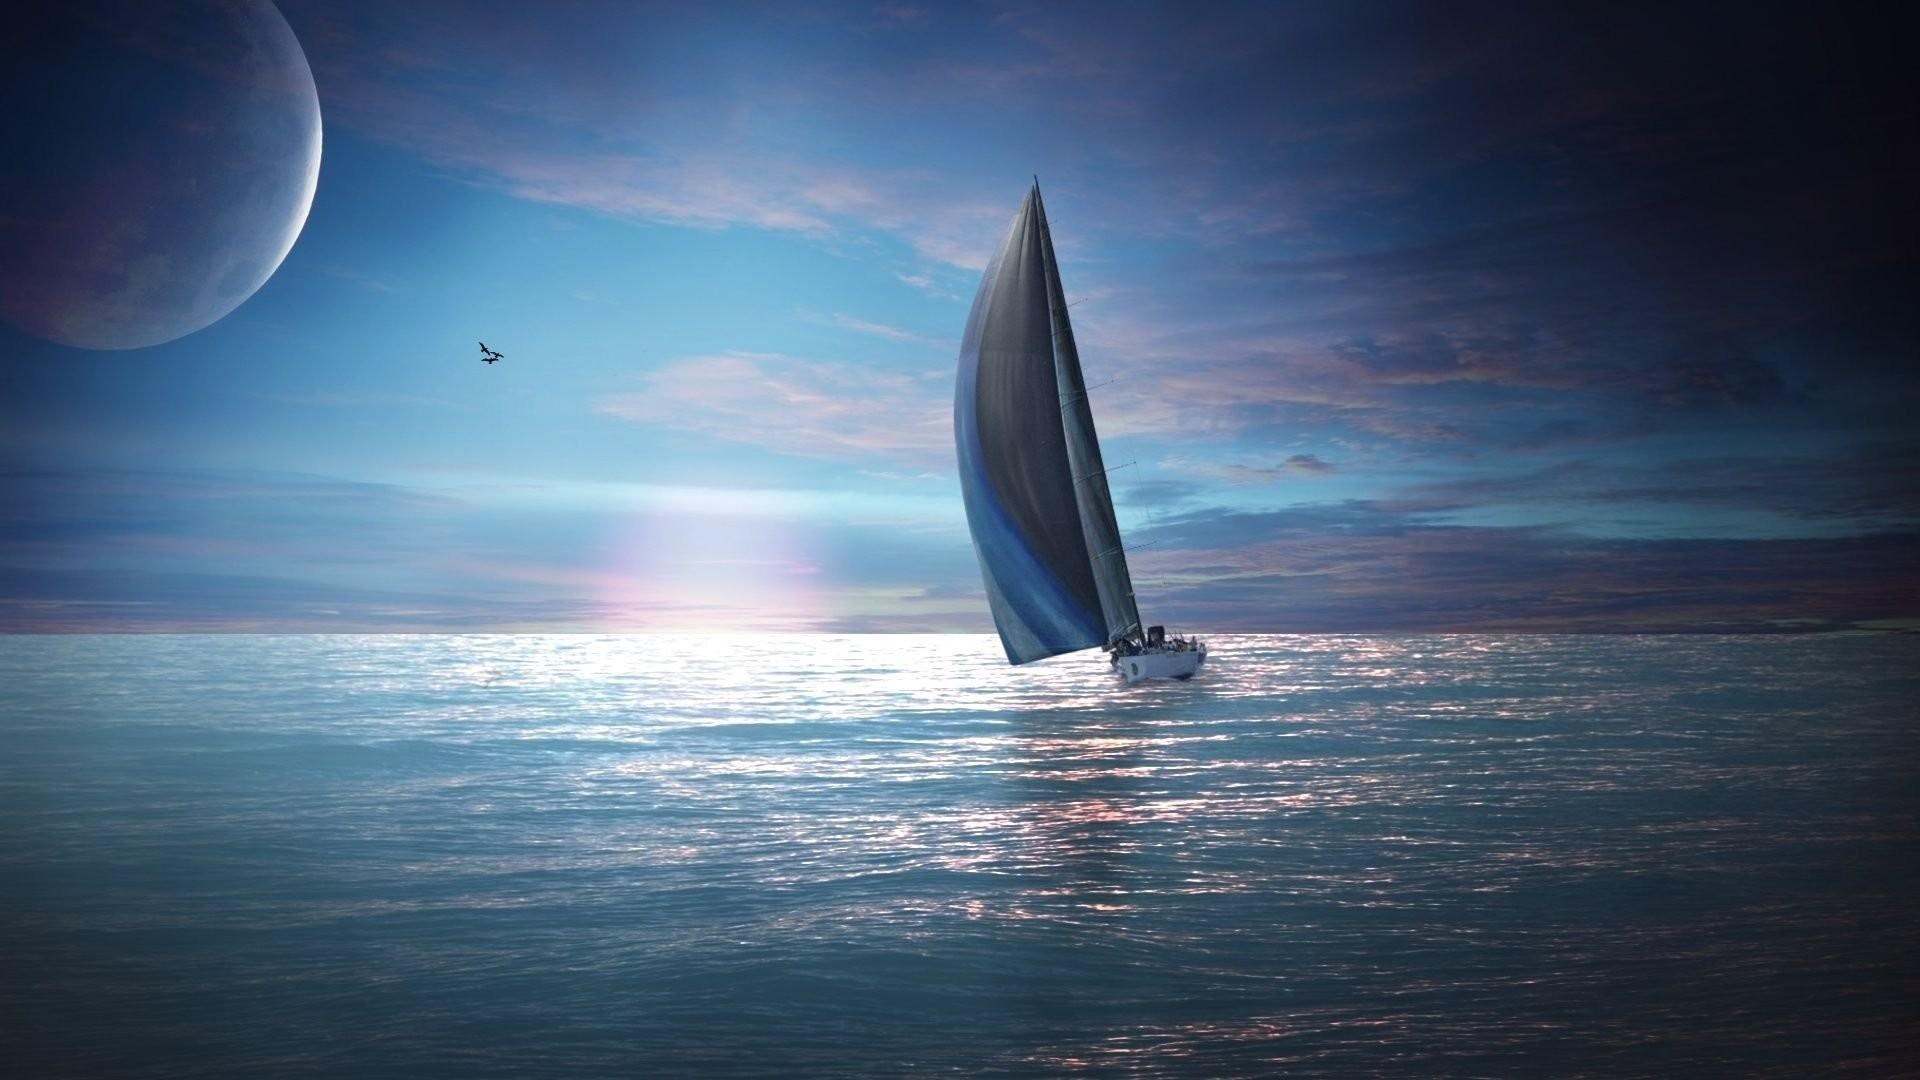 Night Landscape Ocean Moon Boat Sailings Landscapes